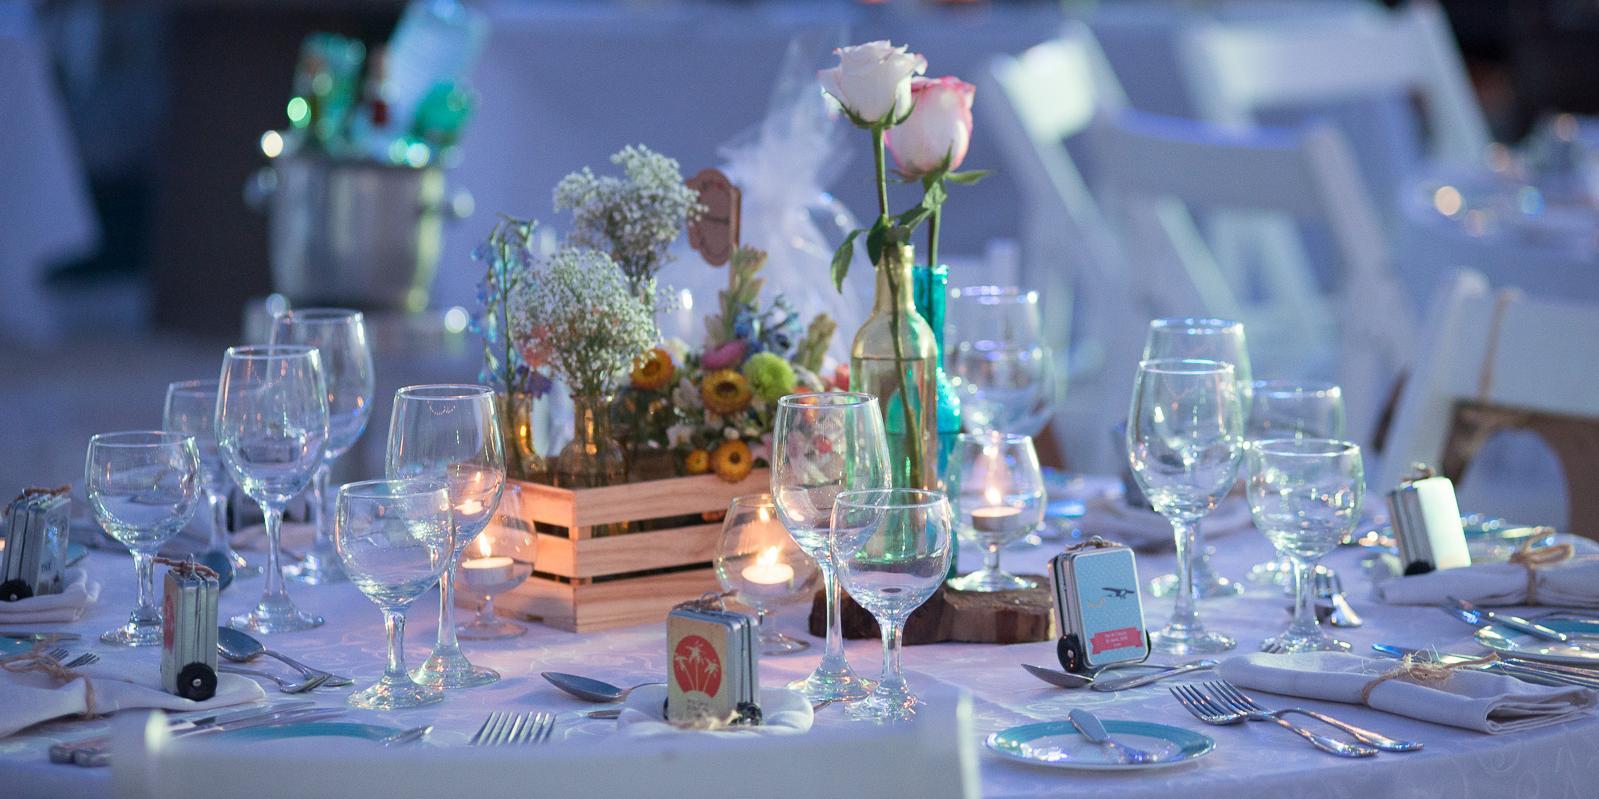 bodas-rustico-playa-cuba-6791.jpg